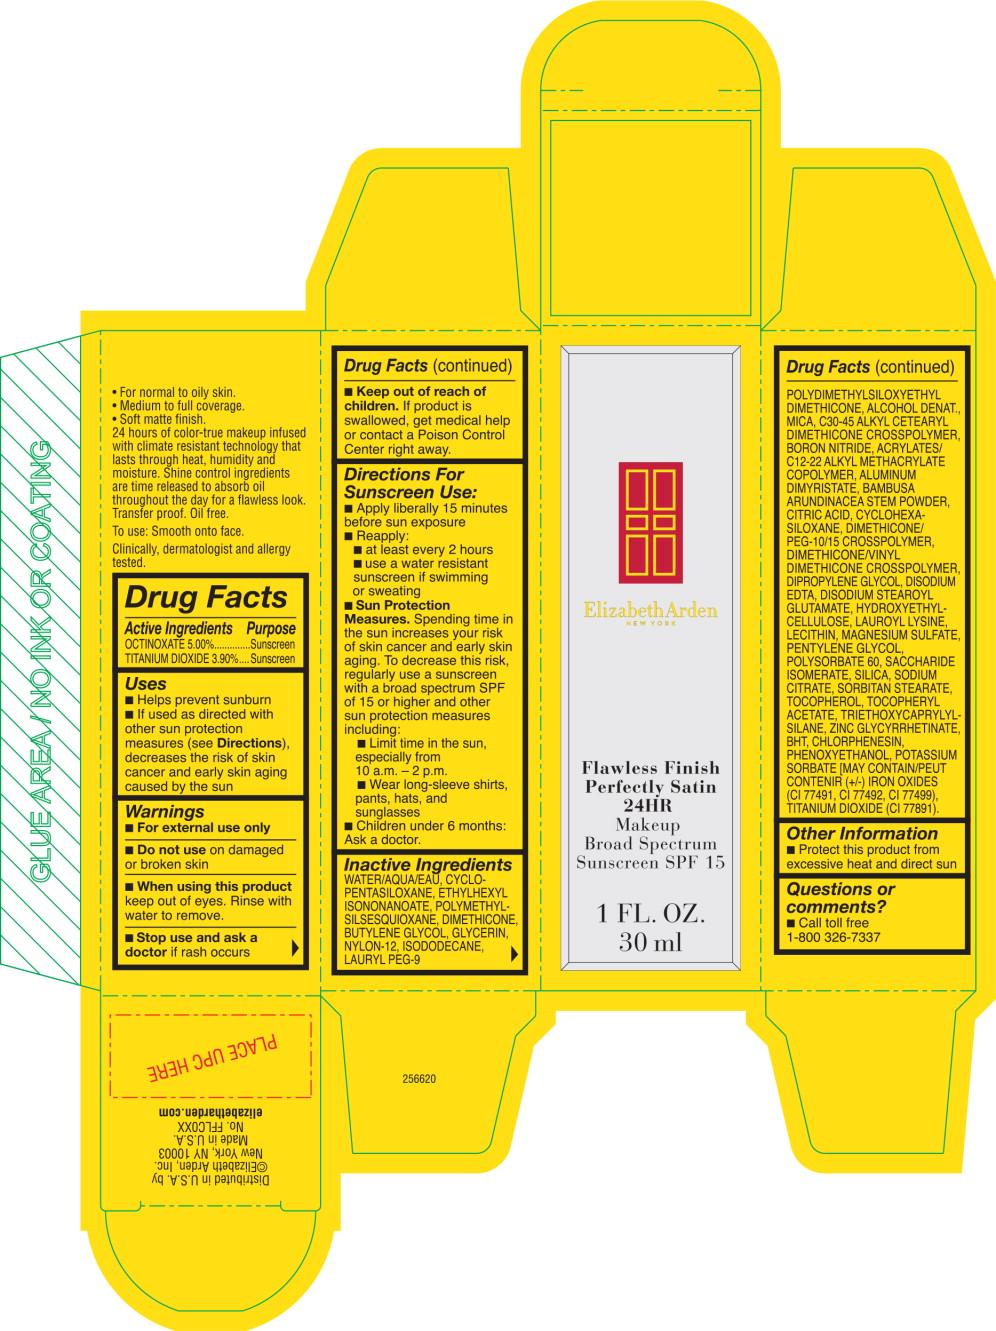 Flawless Finish Perfectly Satinb 24hr Makeup Shade Alabaster (Octinoxate, Titanium Dioxide) Cream [Elizabeth Arden, Inc]